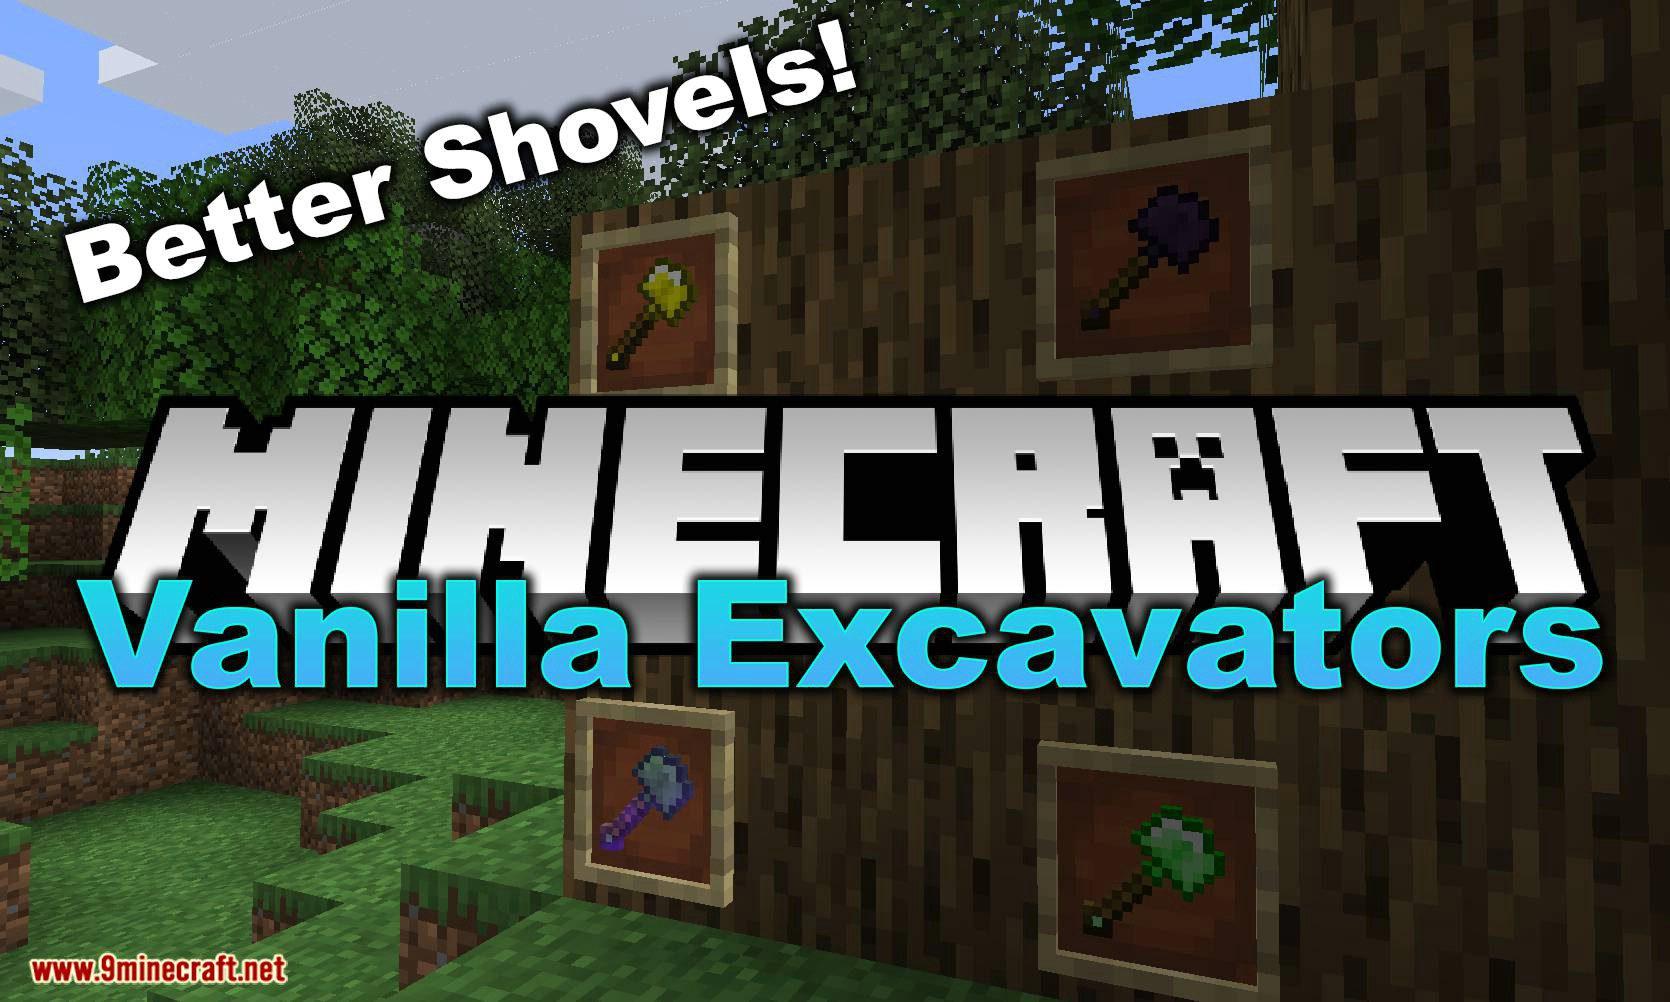 Vanilla Excavators Mod 11212.112126.11212/11212.1121211212.12 (Better Shovels) - 12Minecraft.Net